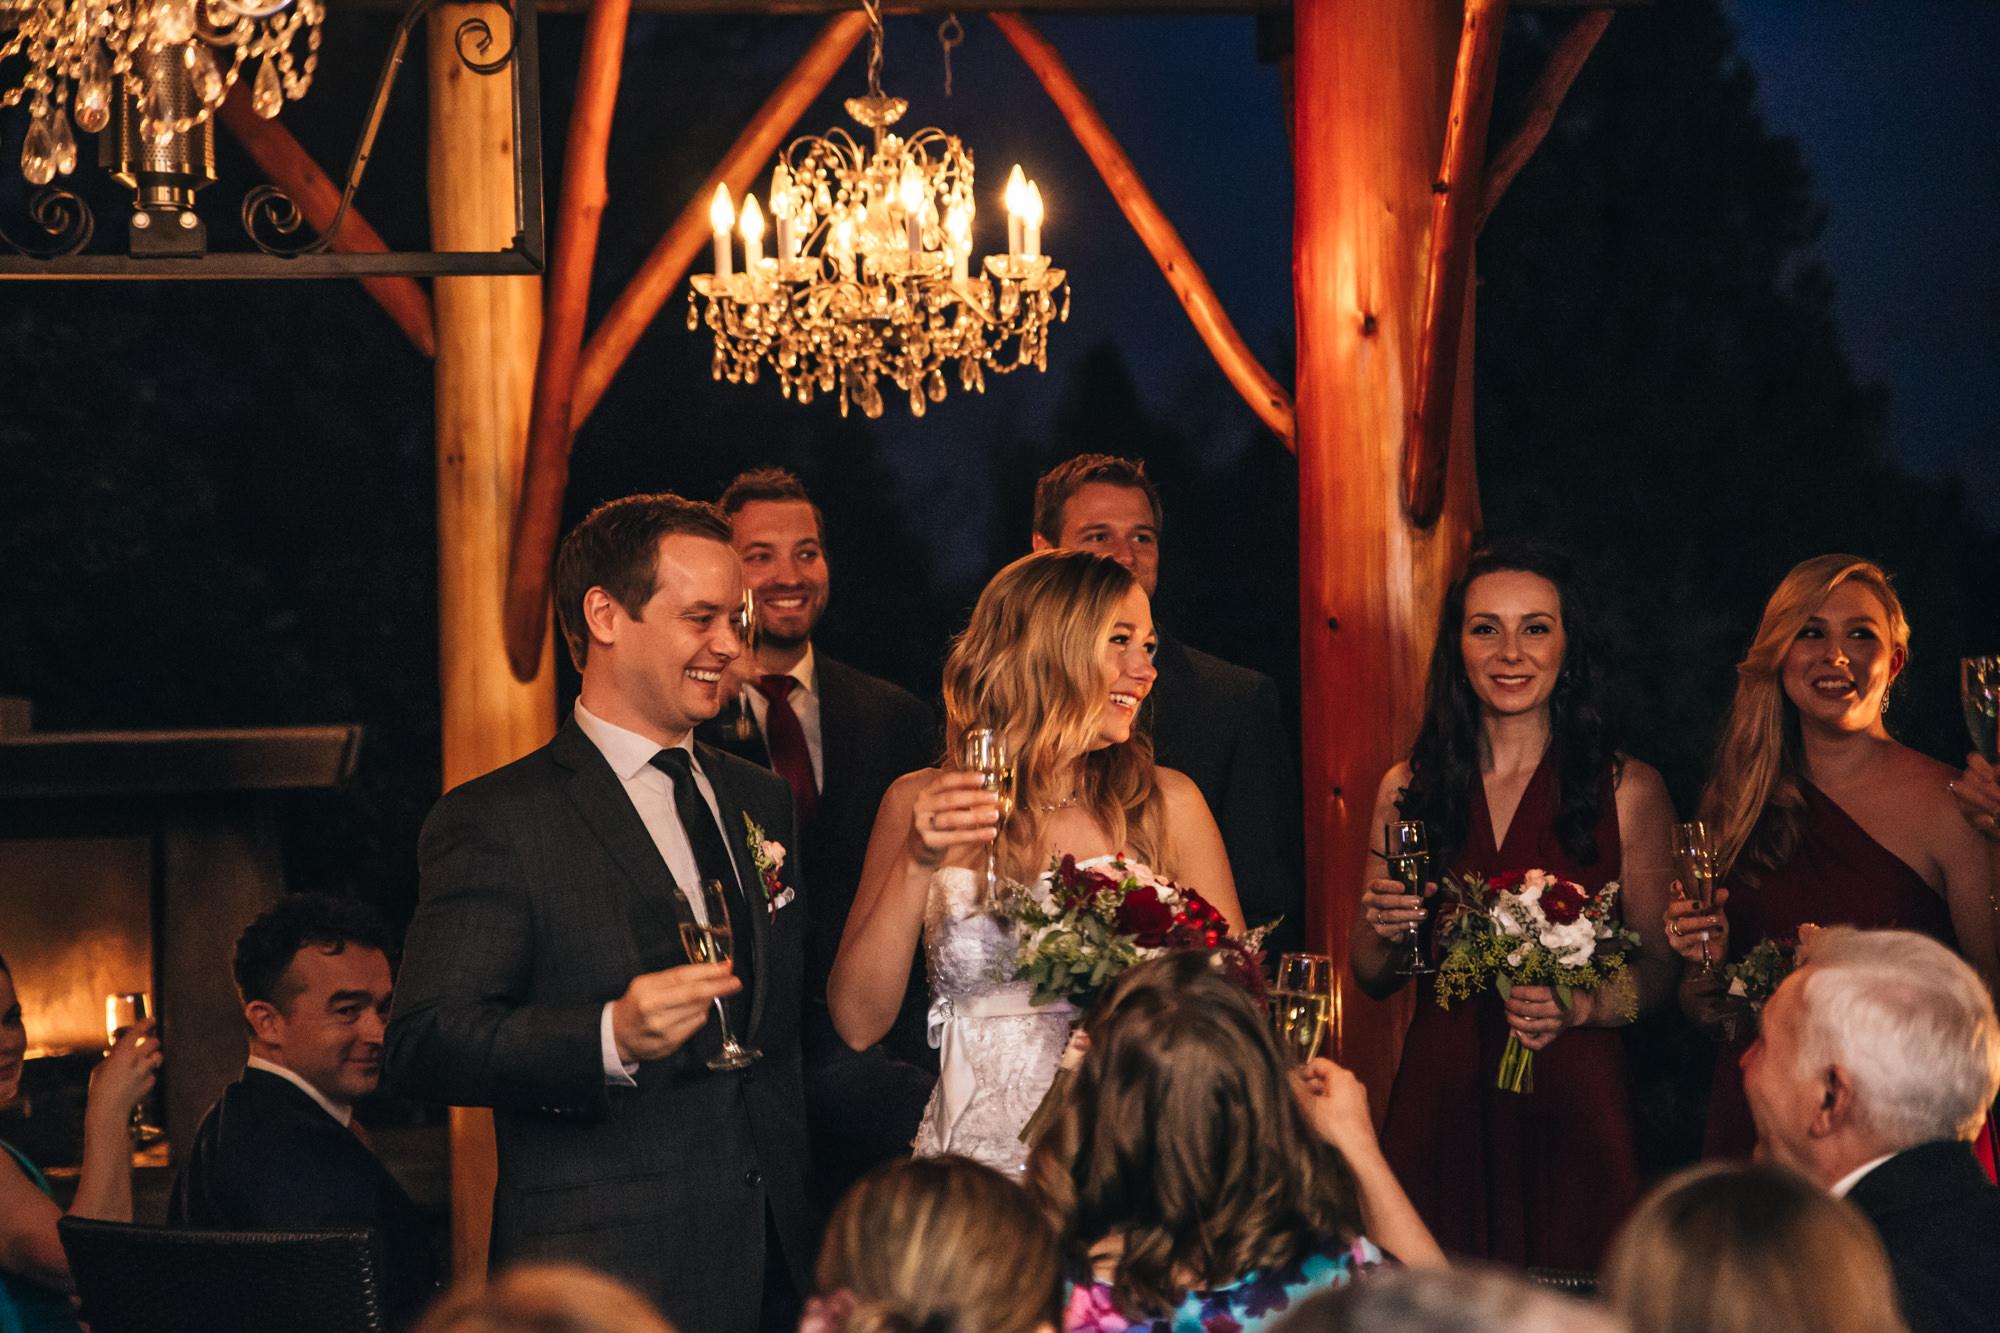 43-seasons-in-the-park-wedding-ceremony.jpg